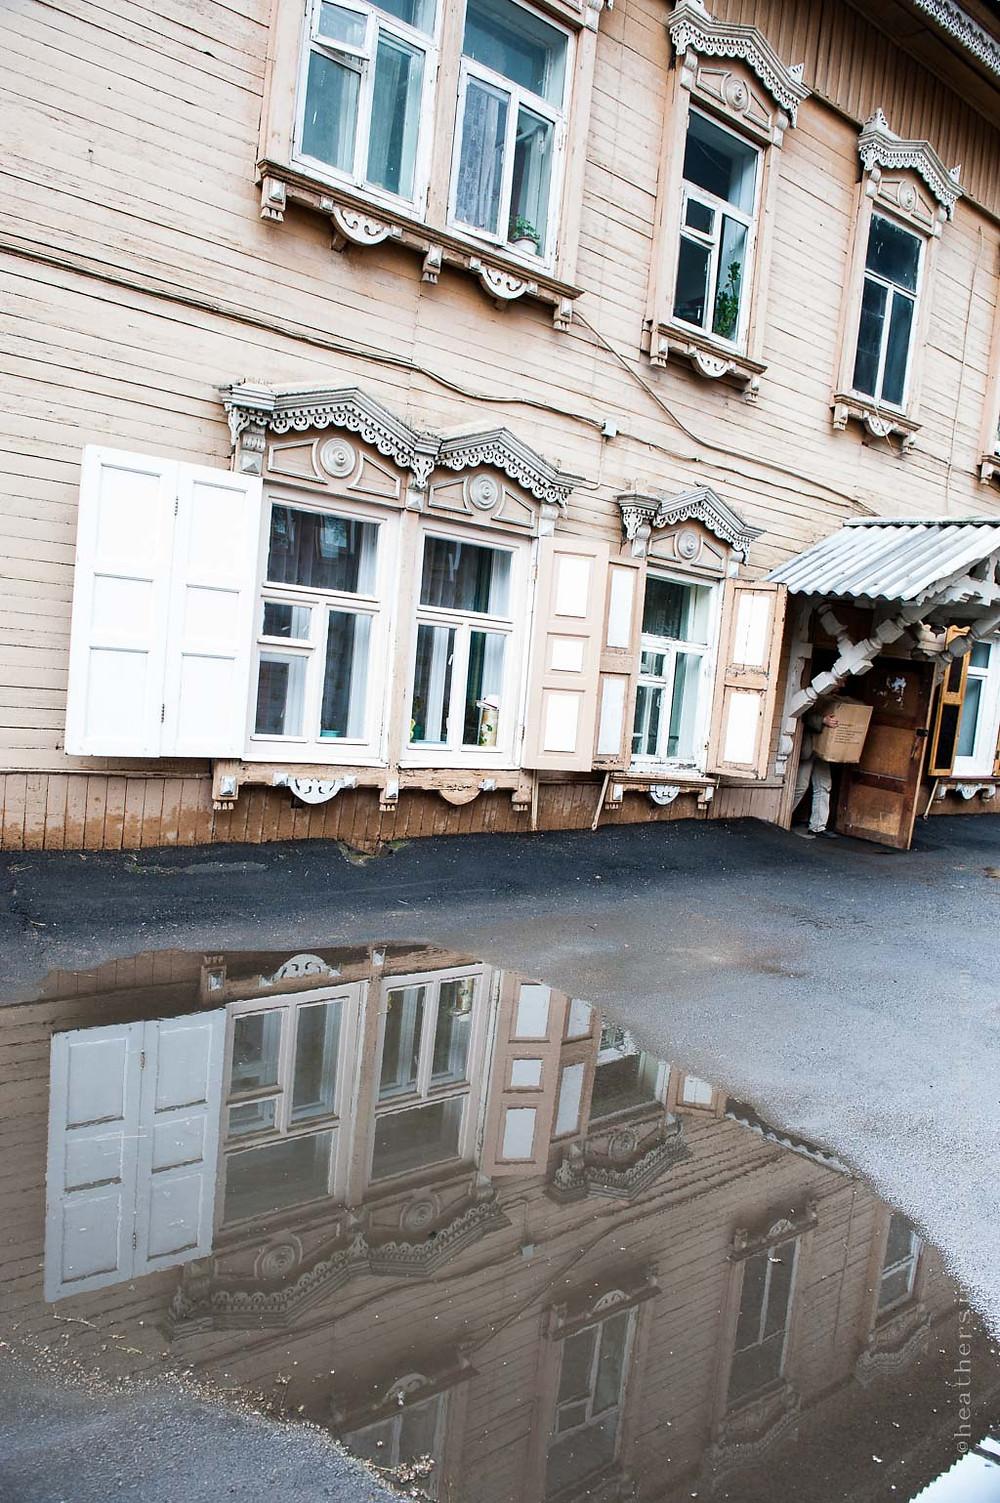 Ulan Ude, Siberia, Russia, reflection